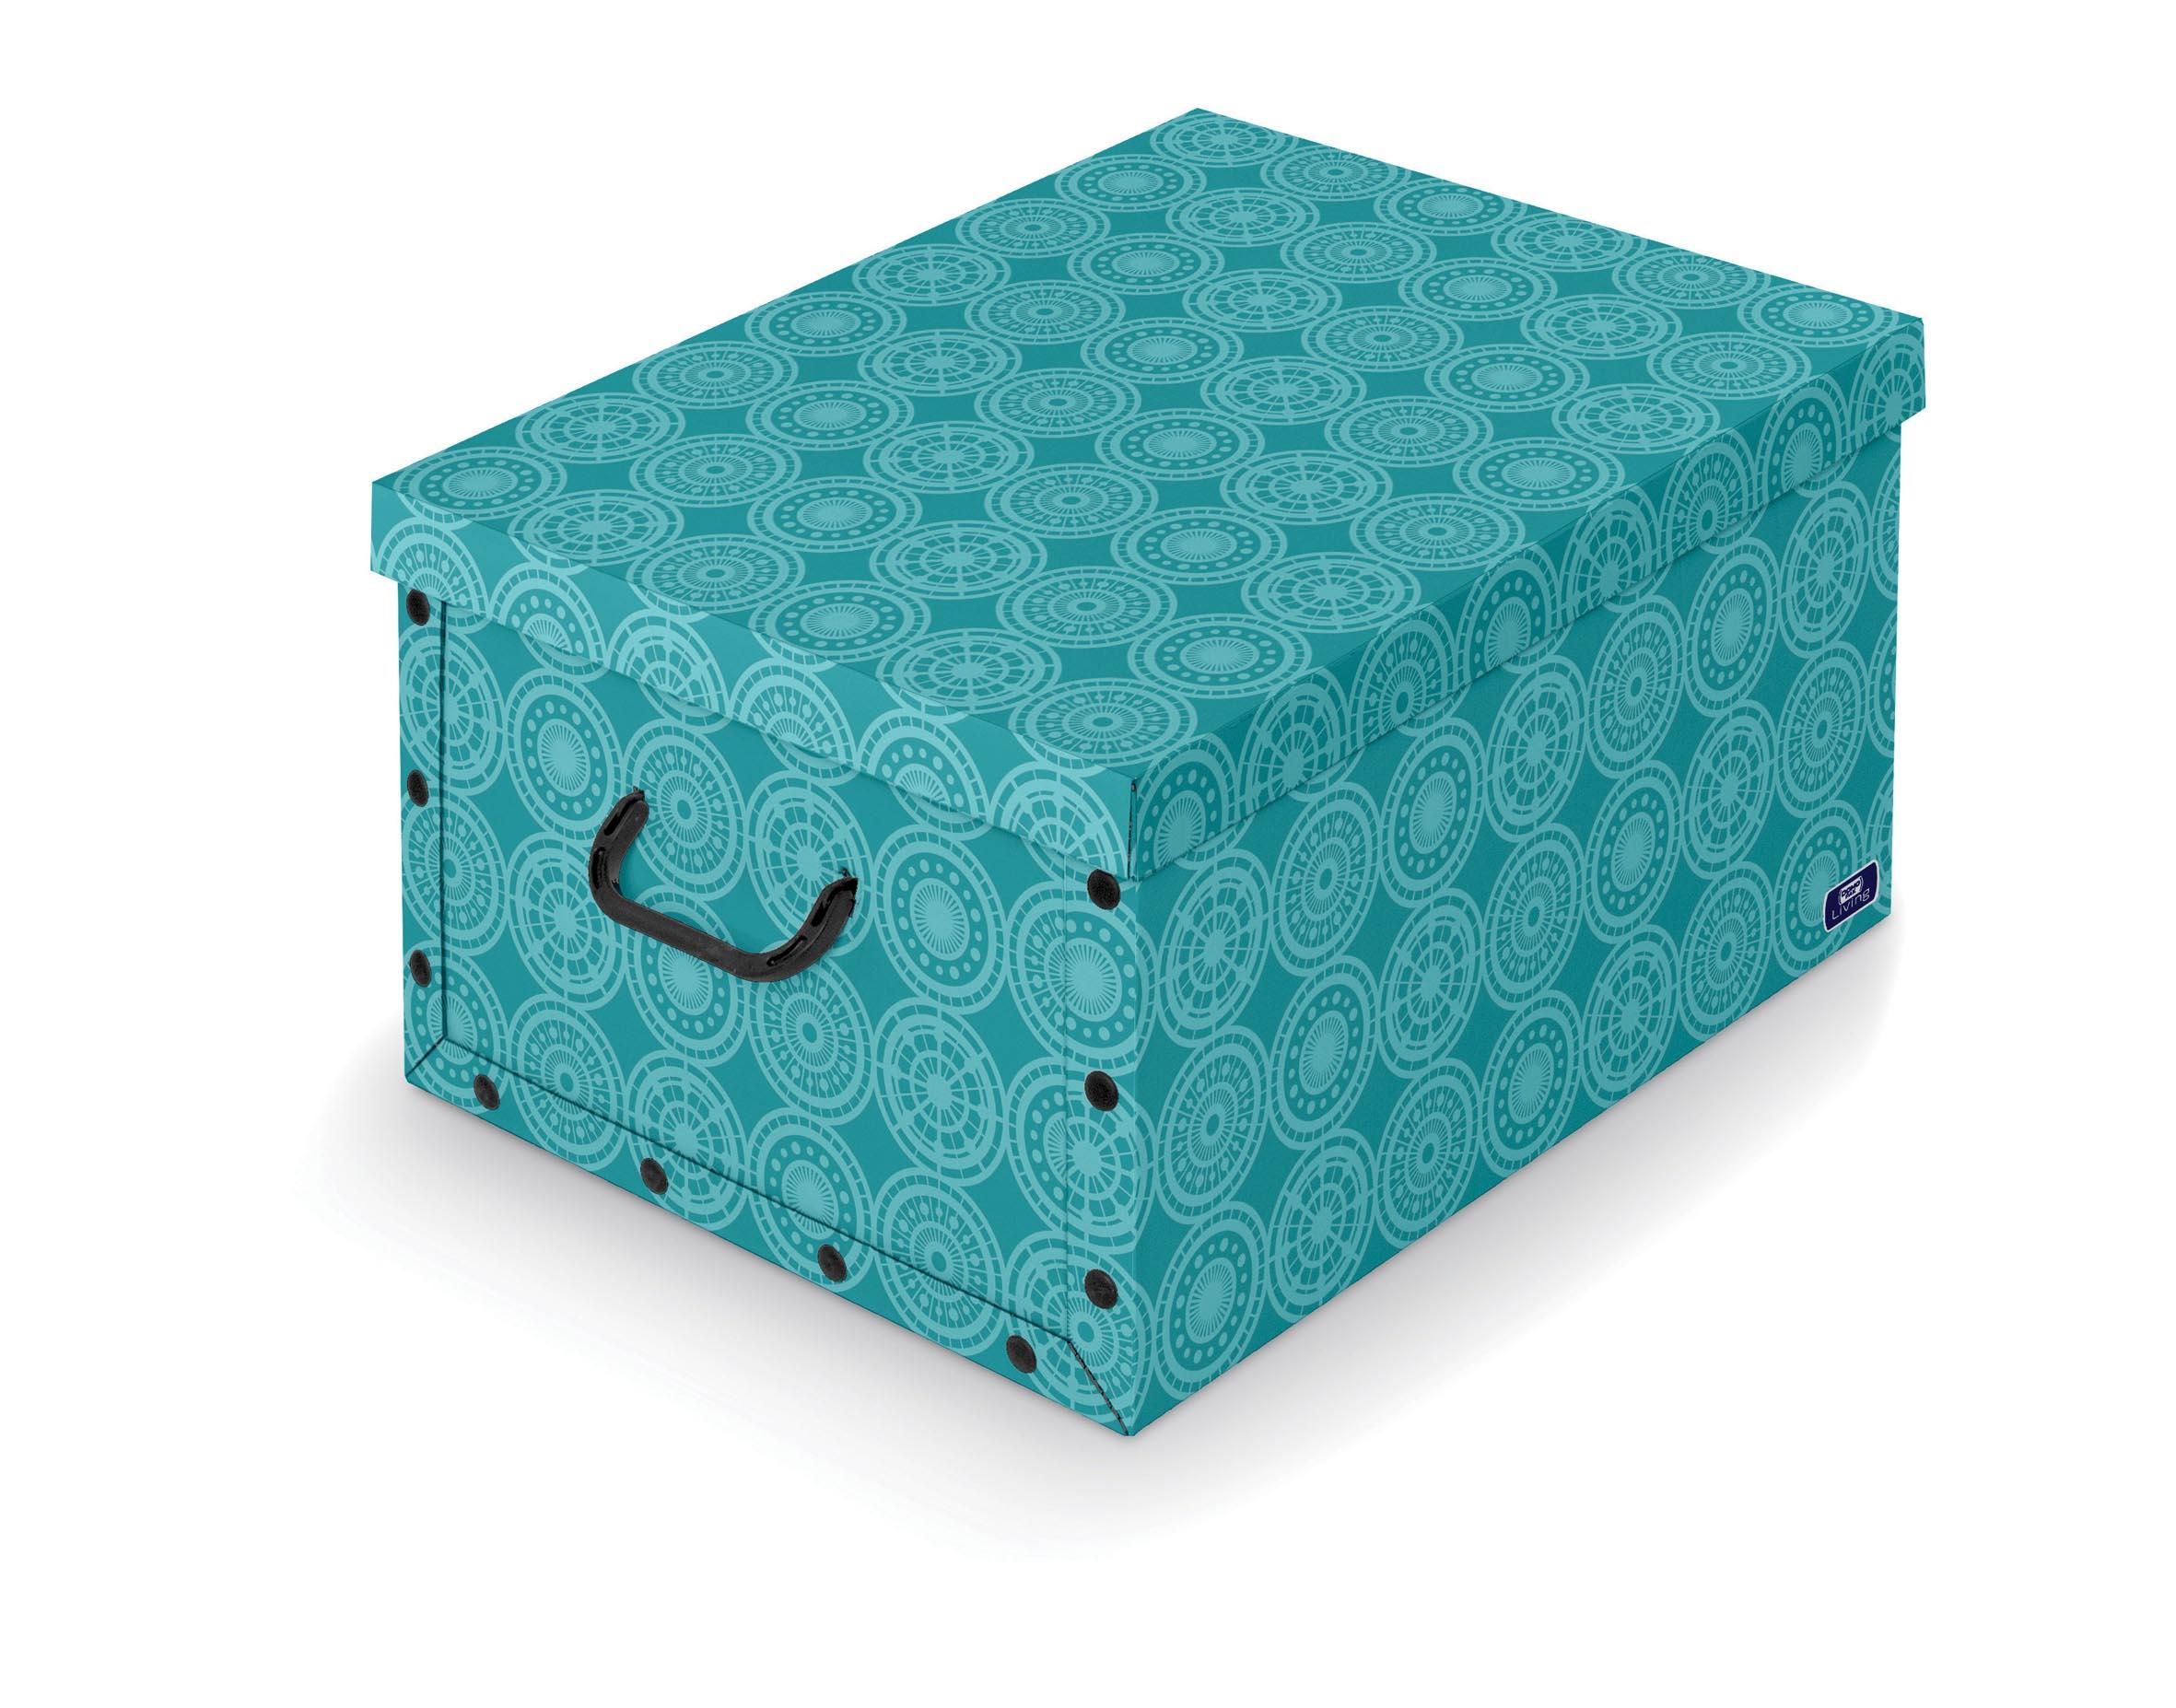 DOMOPAK Living Úložný box s rukojetí 39X50X24cm Barva: modrá